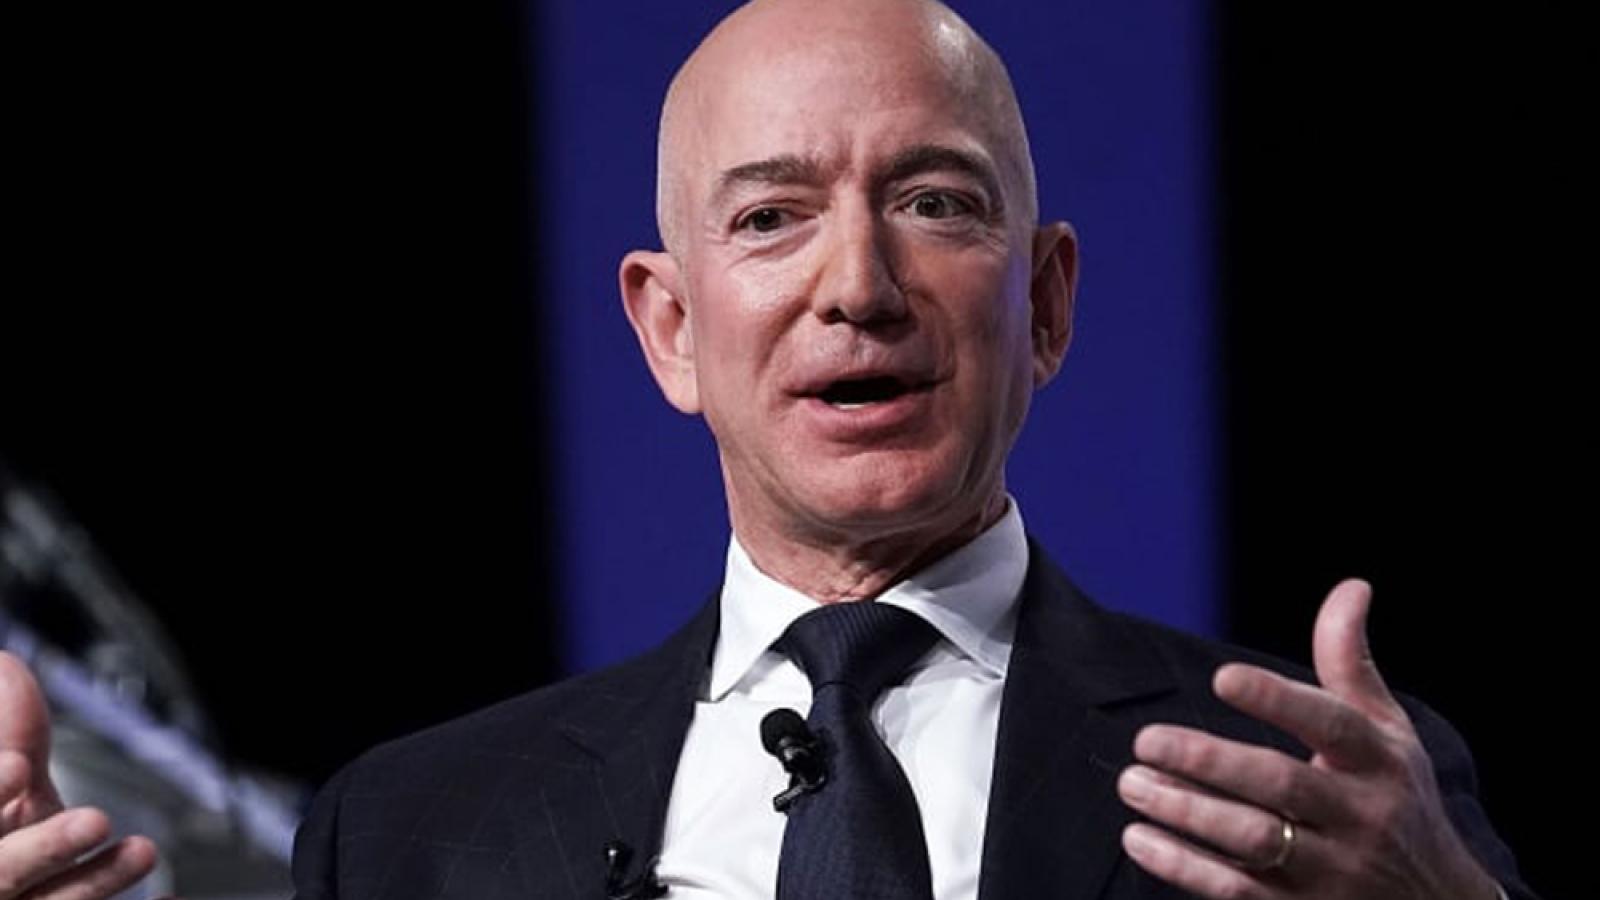 Ông chủ Jeff Bezos bán hơn 3 tỷ USD cổ phiếu Amazon